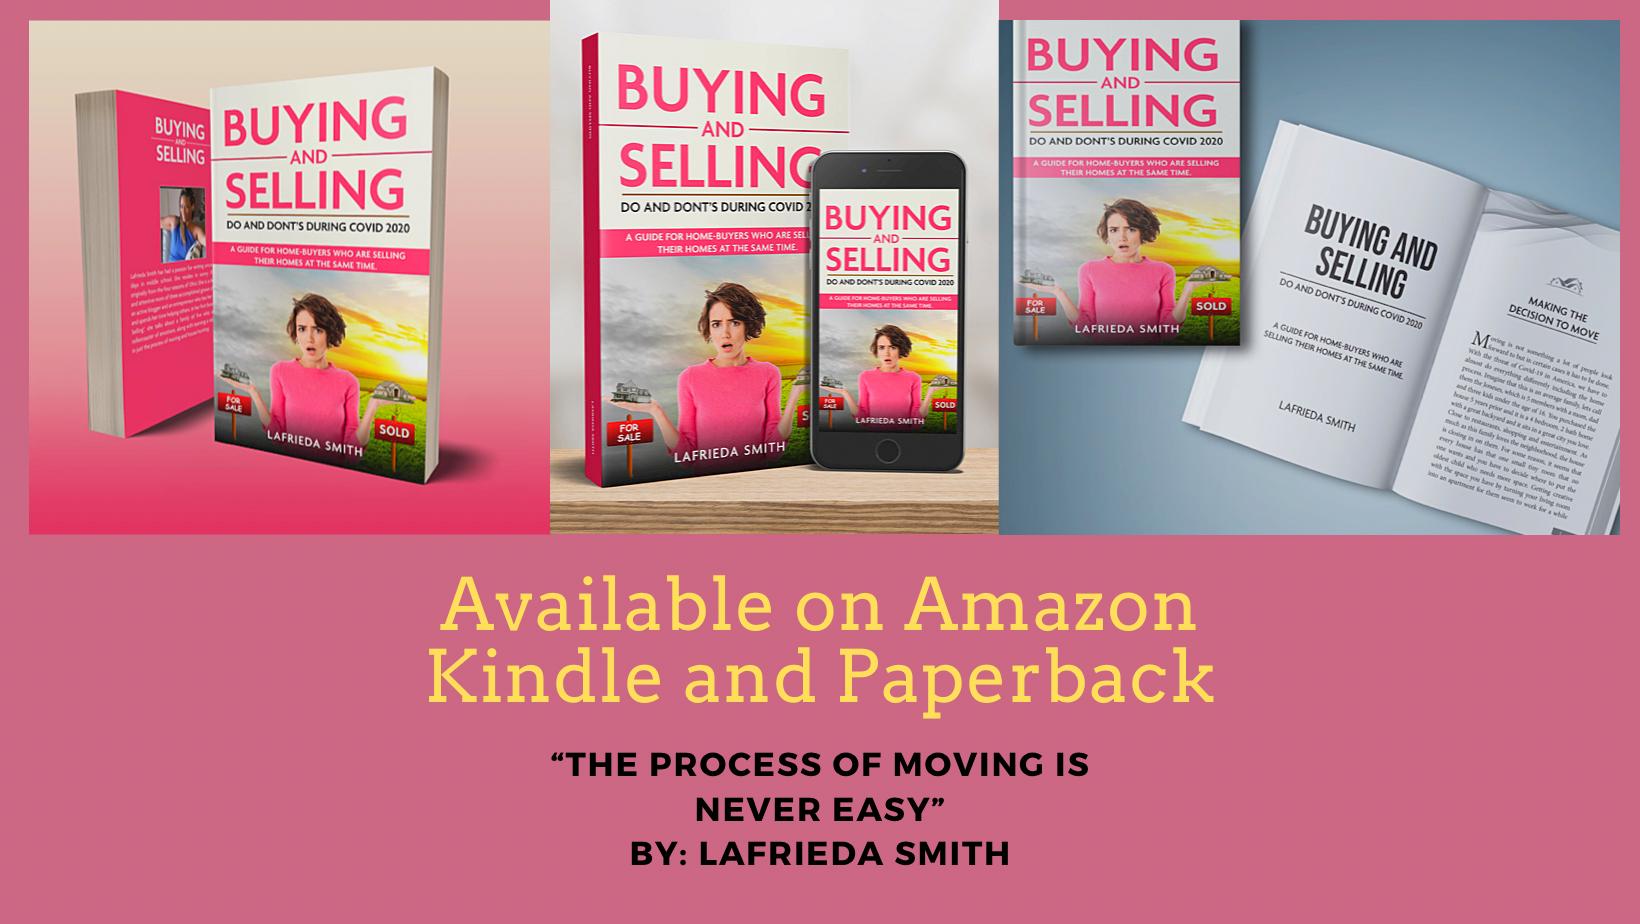 LaFrieda Smith's Cover Image